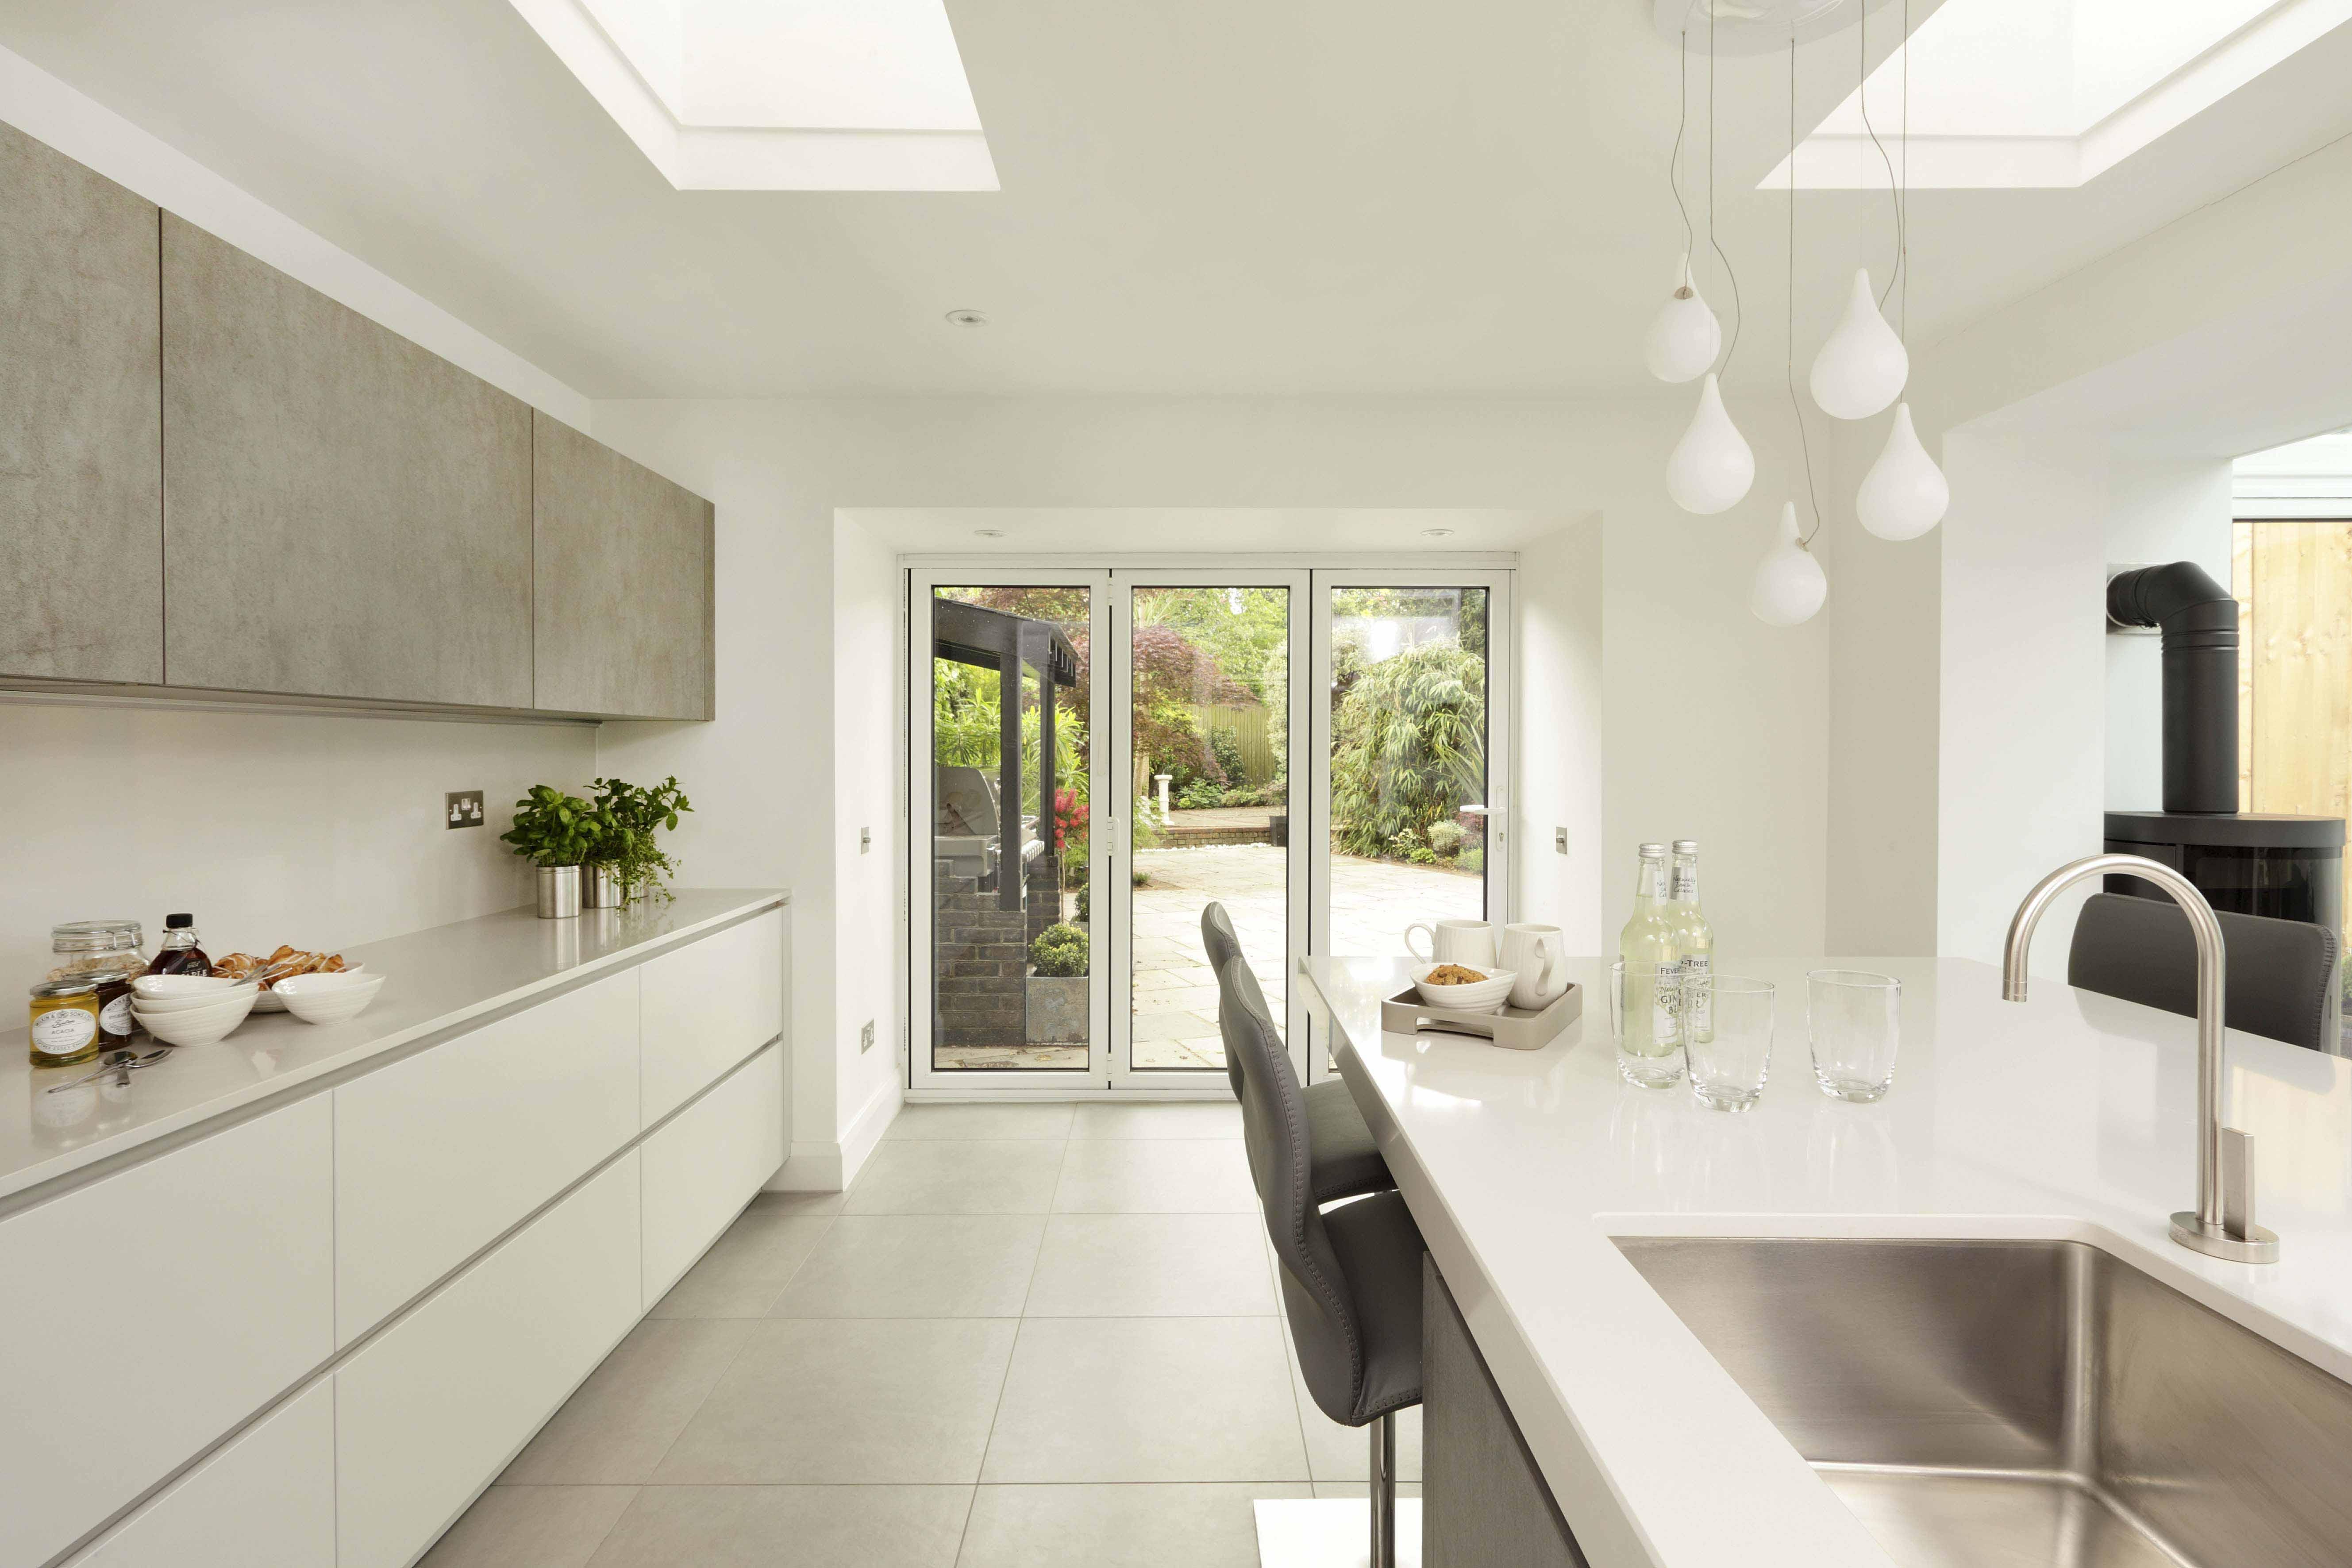 A look round a stylish family friendly kitchen der kern for Miele kitchen designs